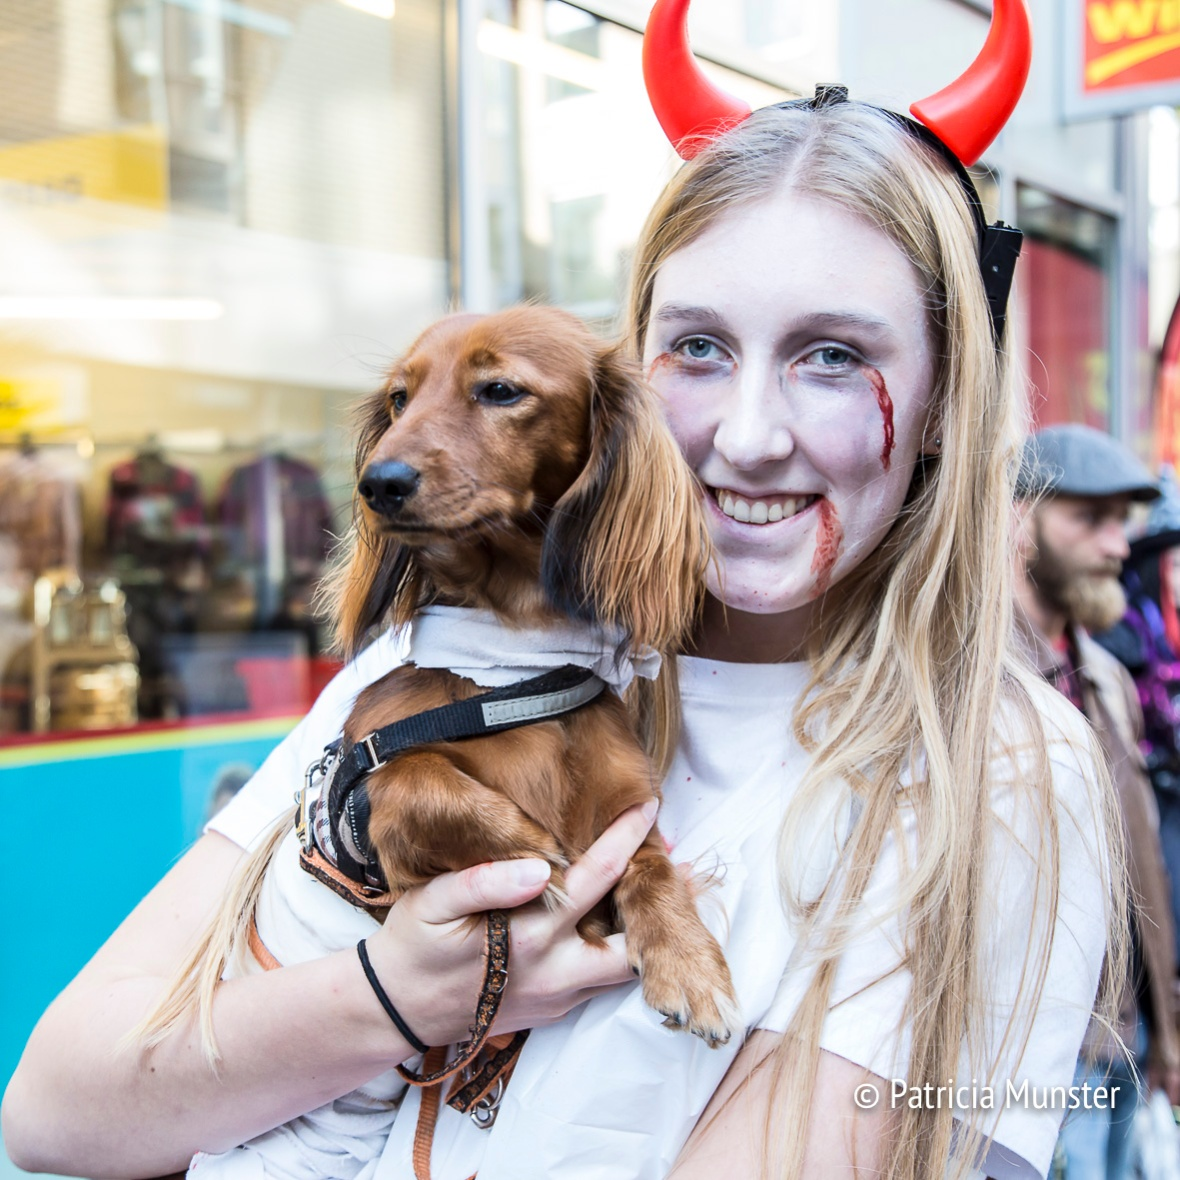 Halloween Zoetermeer.Halloween Dog Parade Zoetermeer Patricia Munster 25